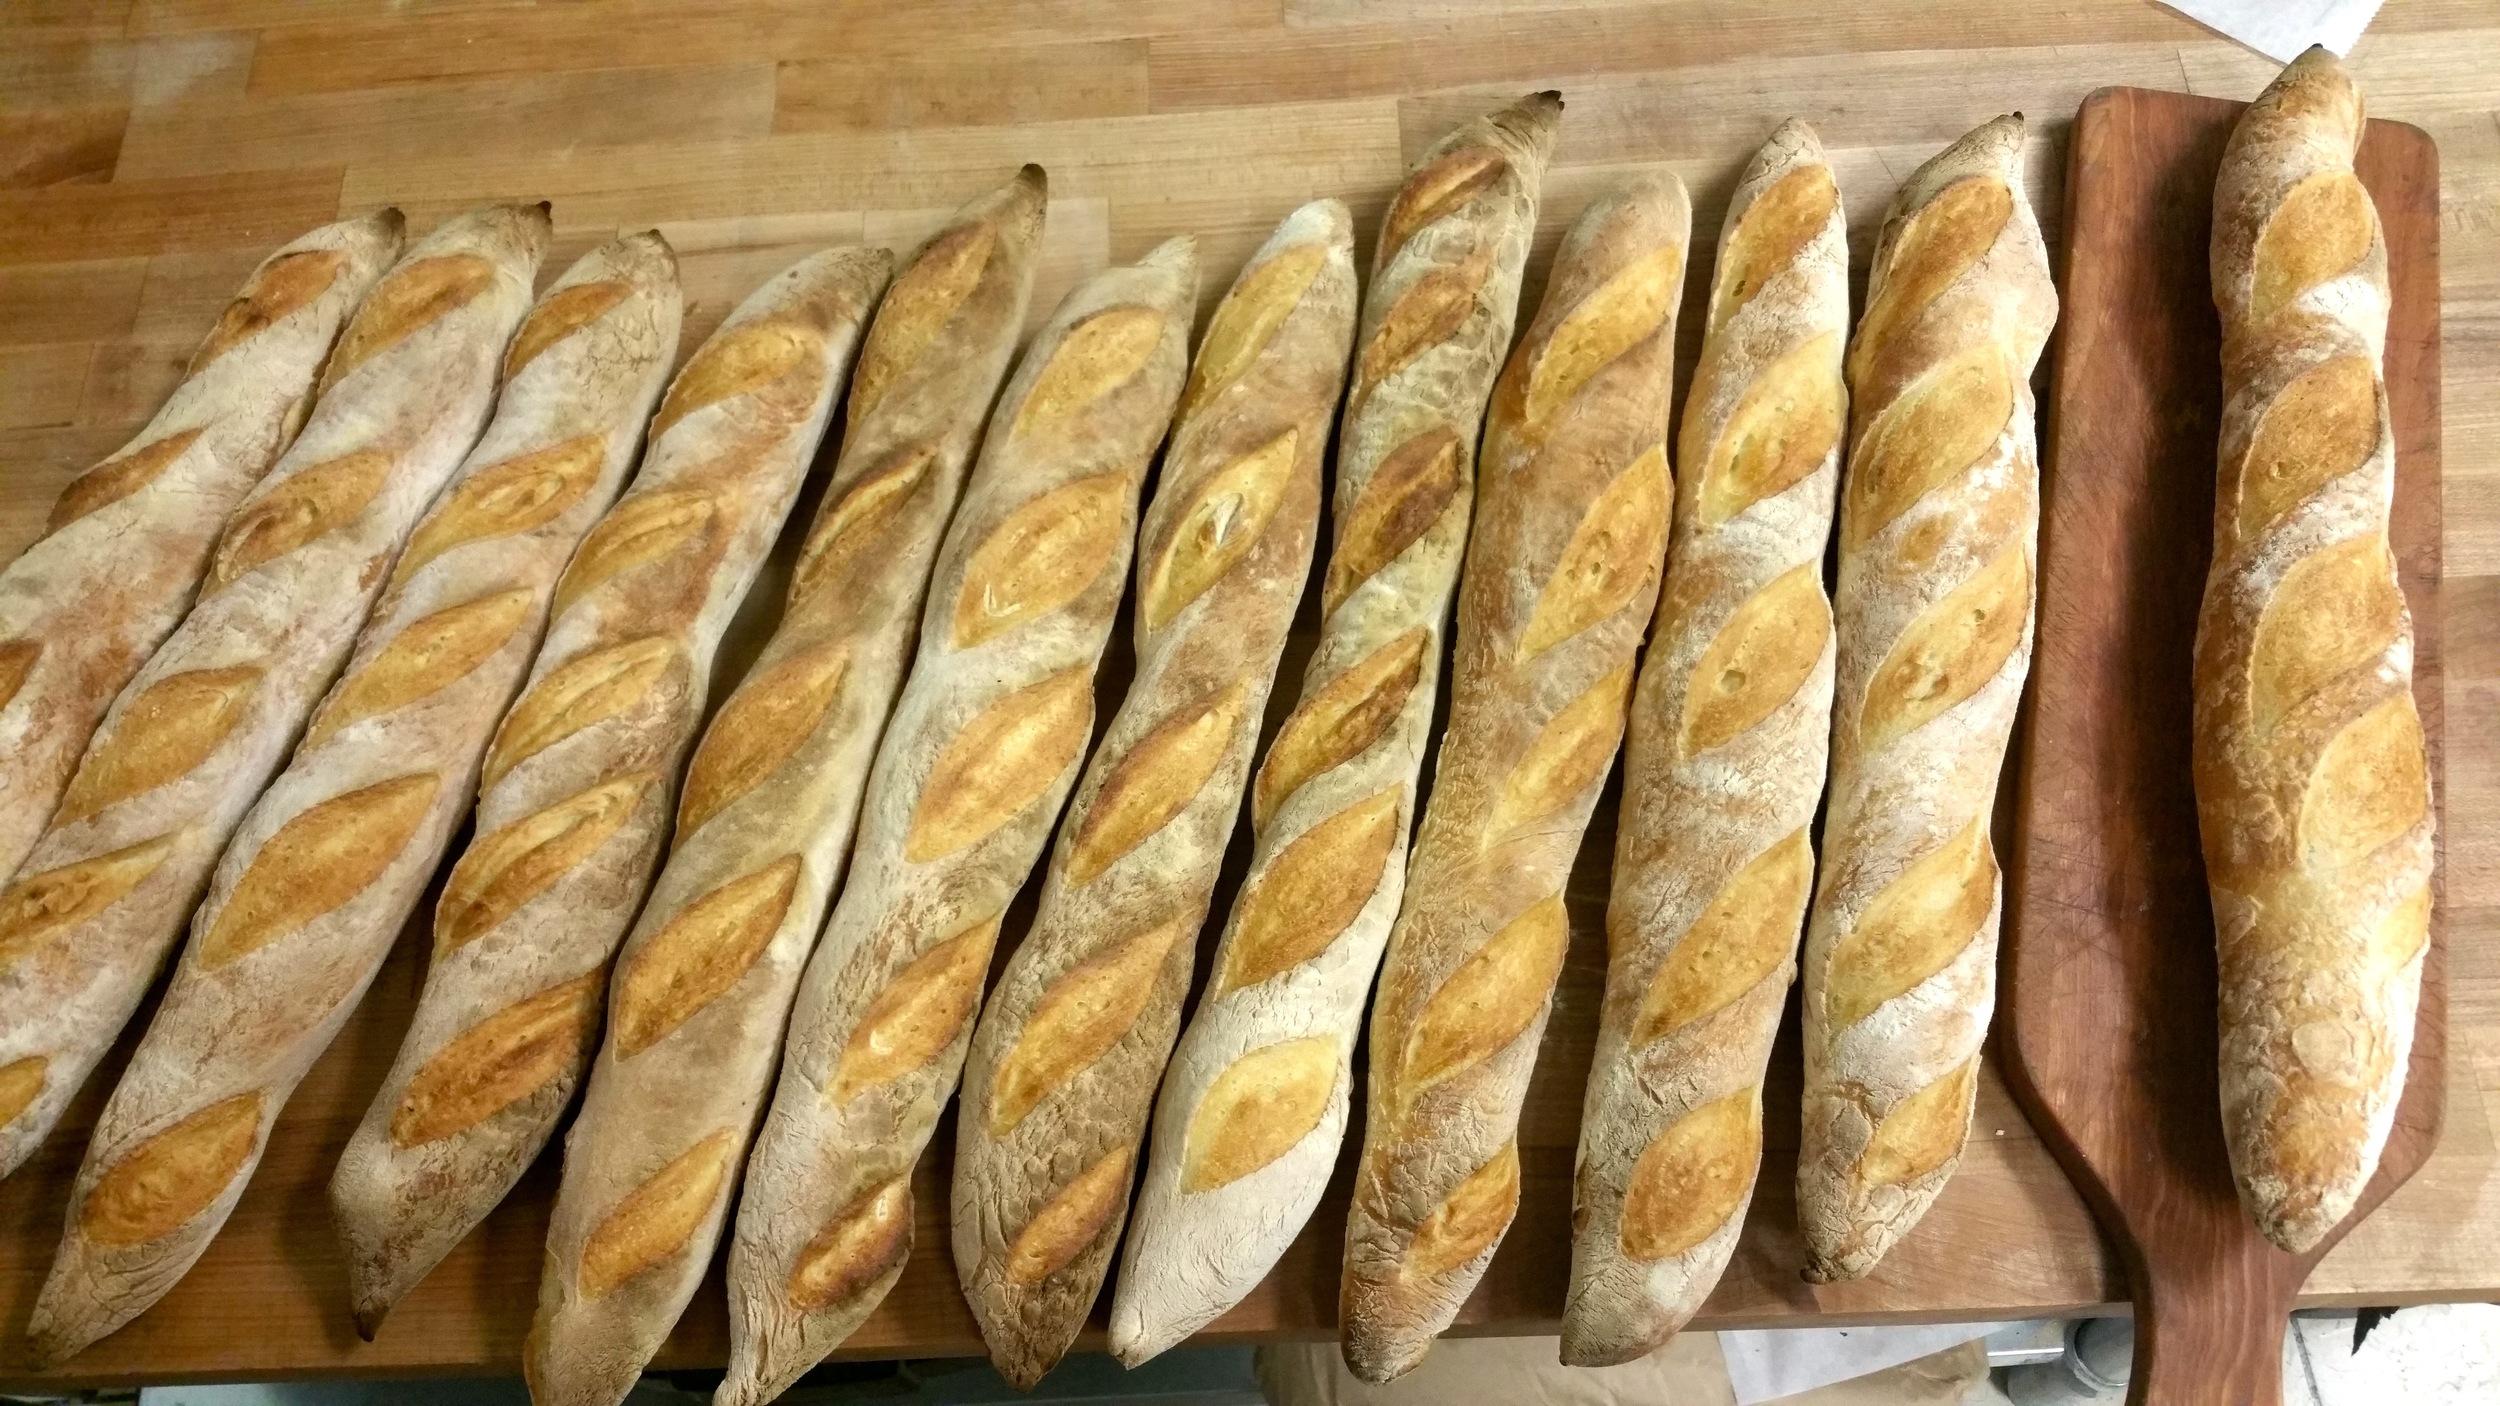 https://squareup.com/store/classesatdeazucar/item/artisan-bread-basics-1